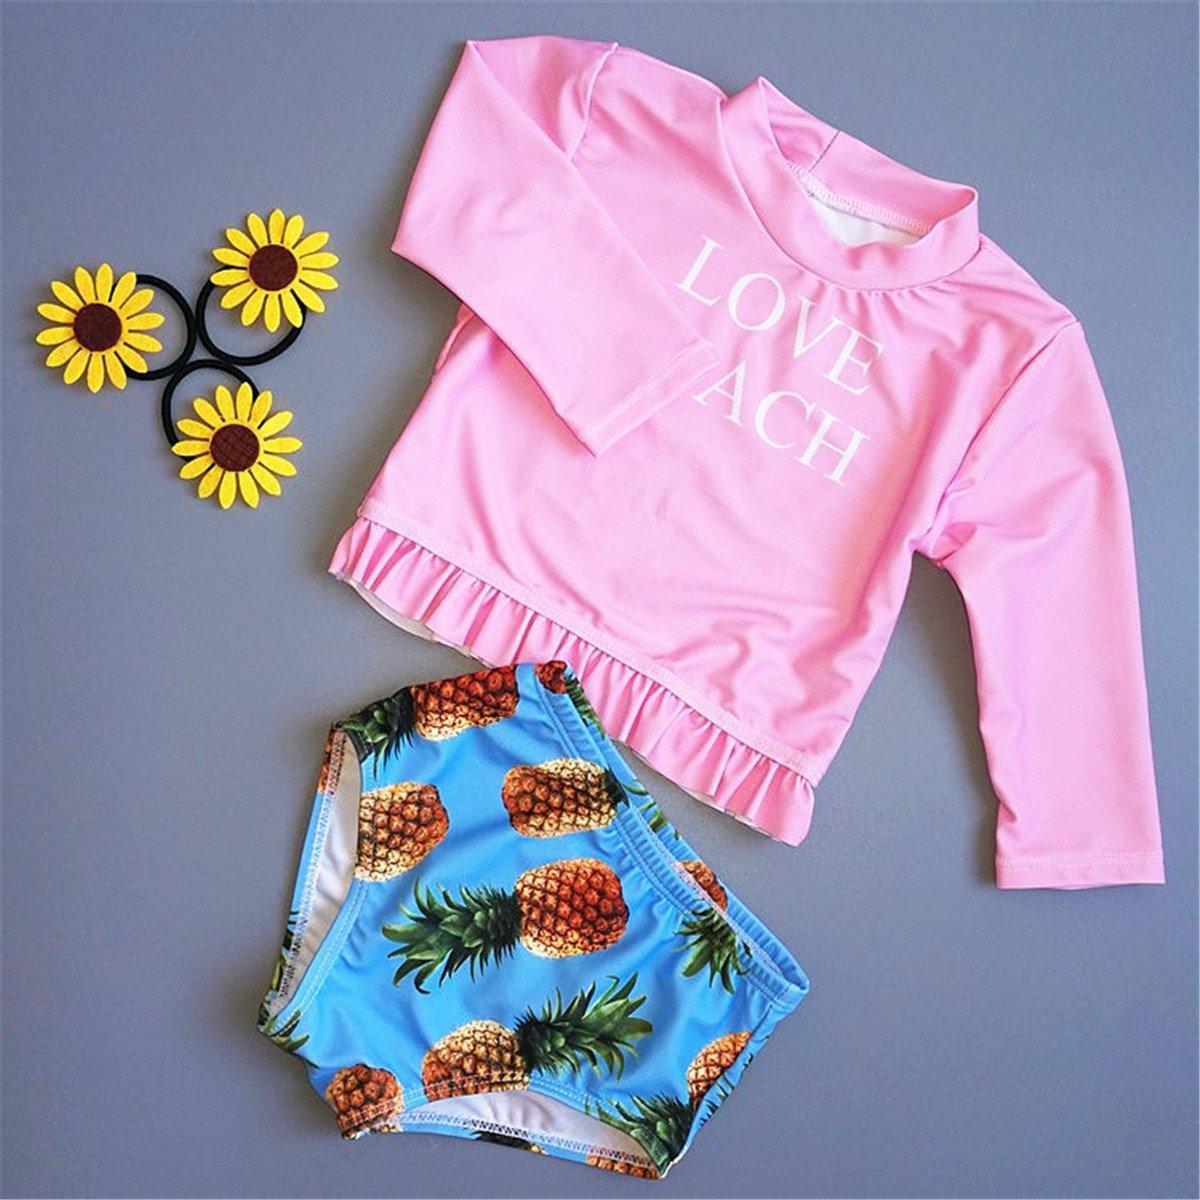 Baby Kids Girls Two Pieces Long Sleeve Sun Protection Pineapple Print Swimsuit UV Rash Guard Set 2-3 Years